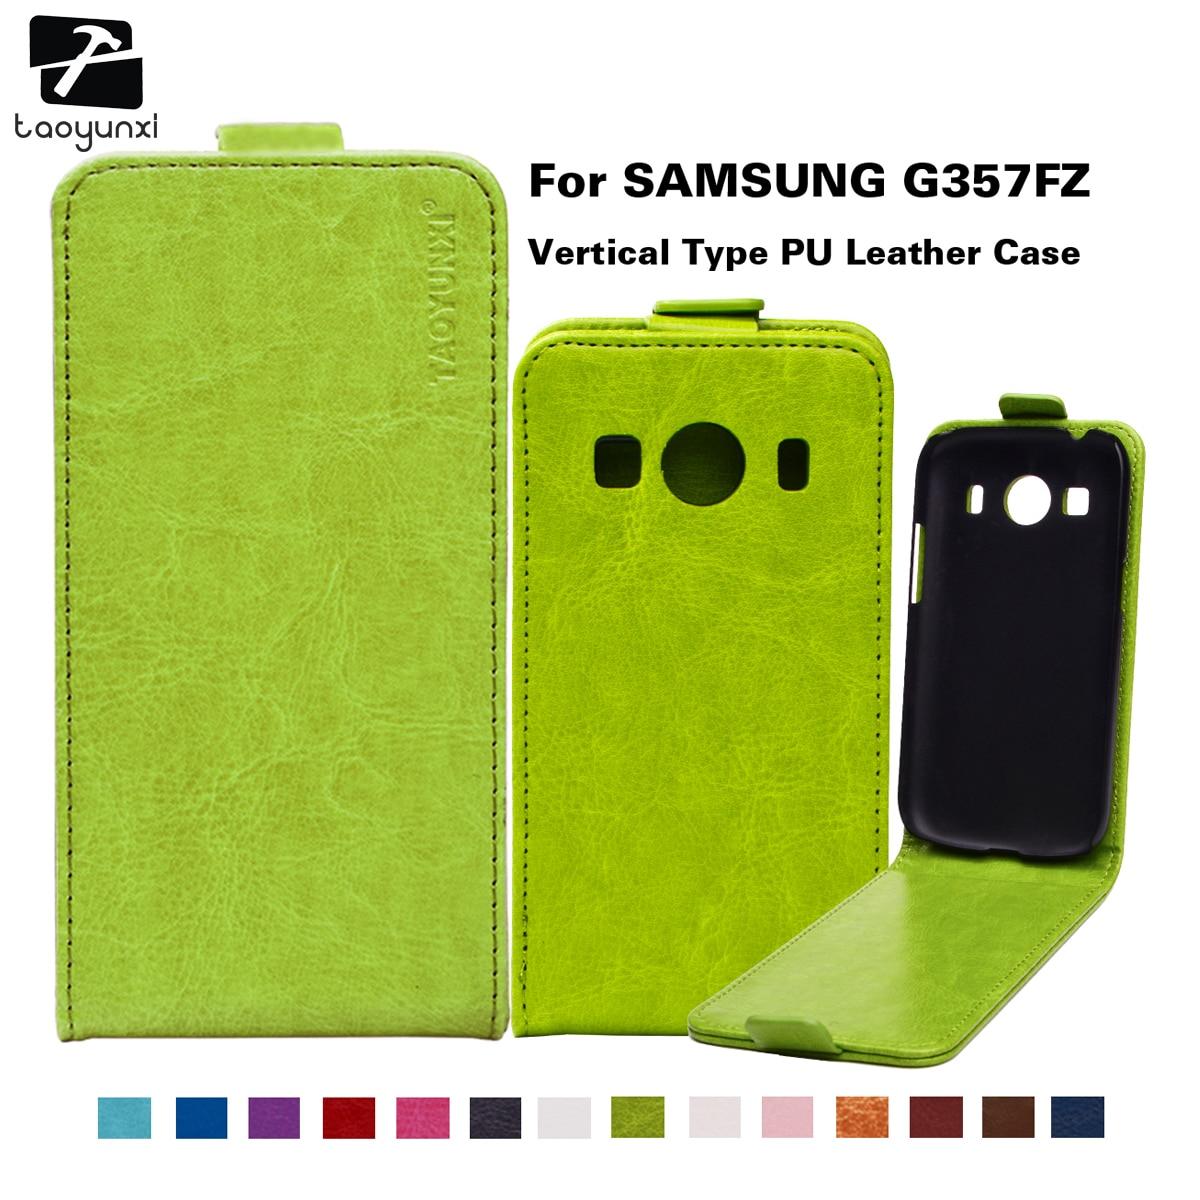 Pu Leather Case For Samsung Galaxy Ace 4 Lite G313 G313h Sm G313h2 Cassing Casing Housing V Fullset Taoyunxi Phone Lte G357fz Cover Style G357